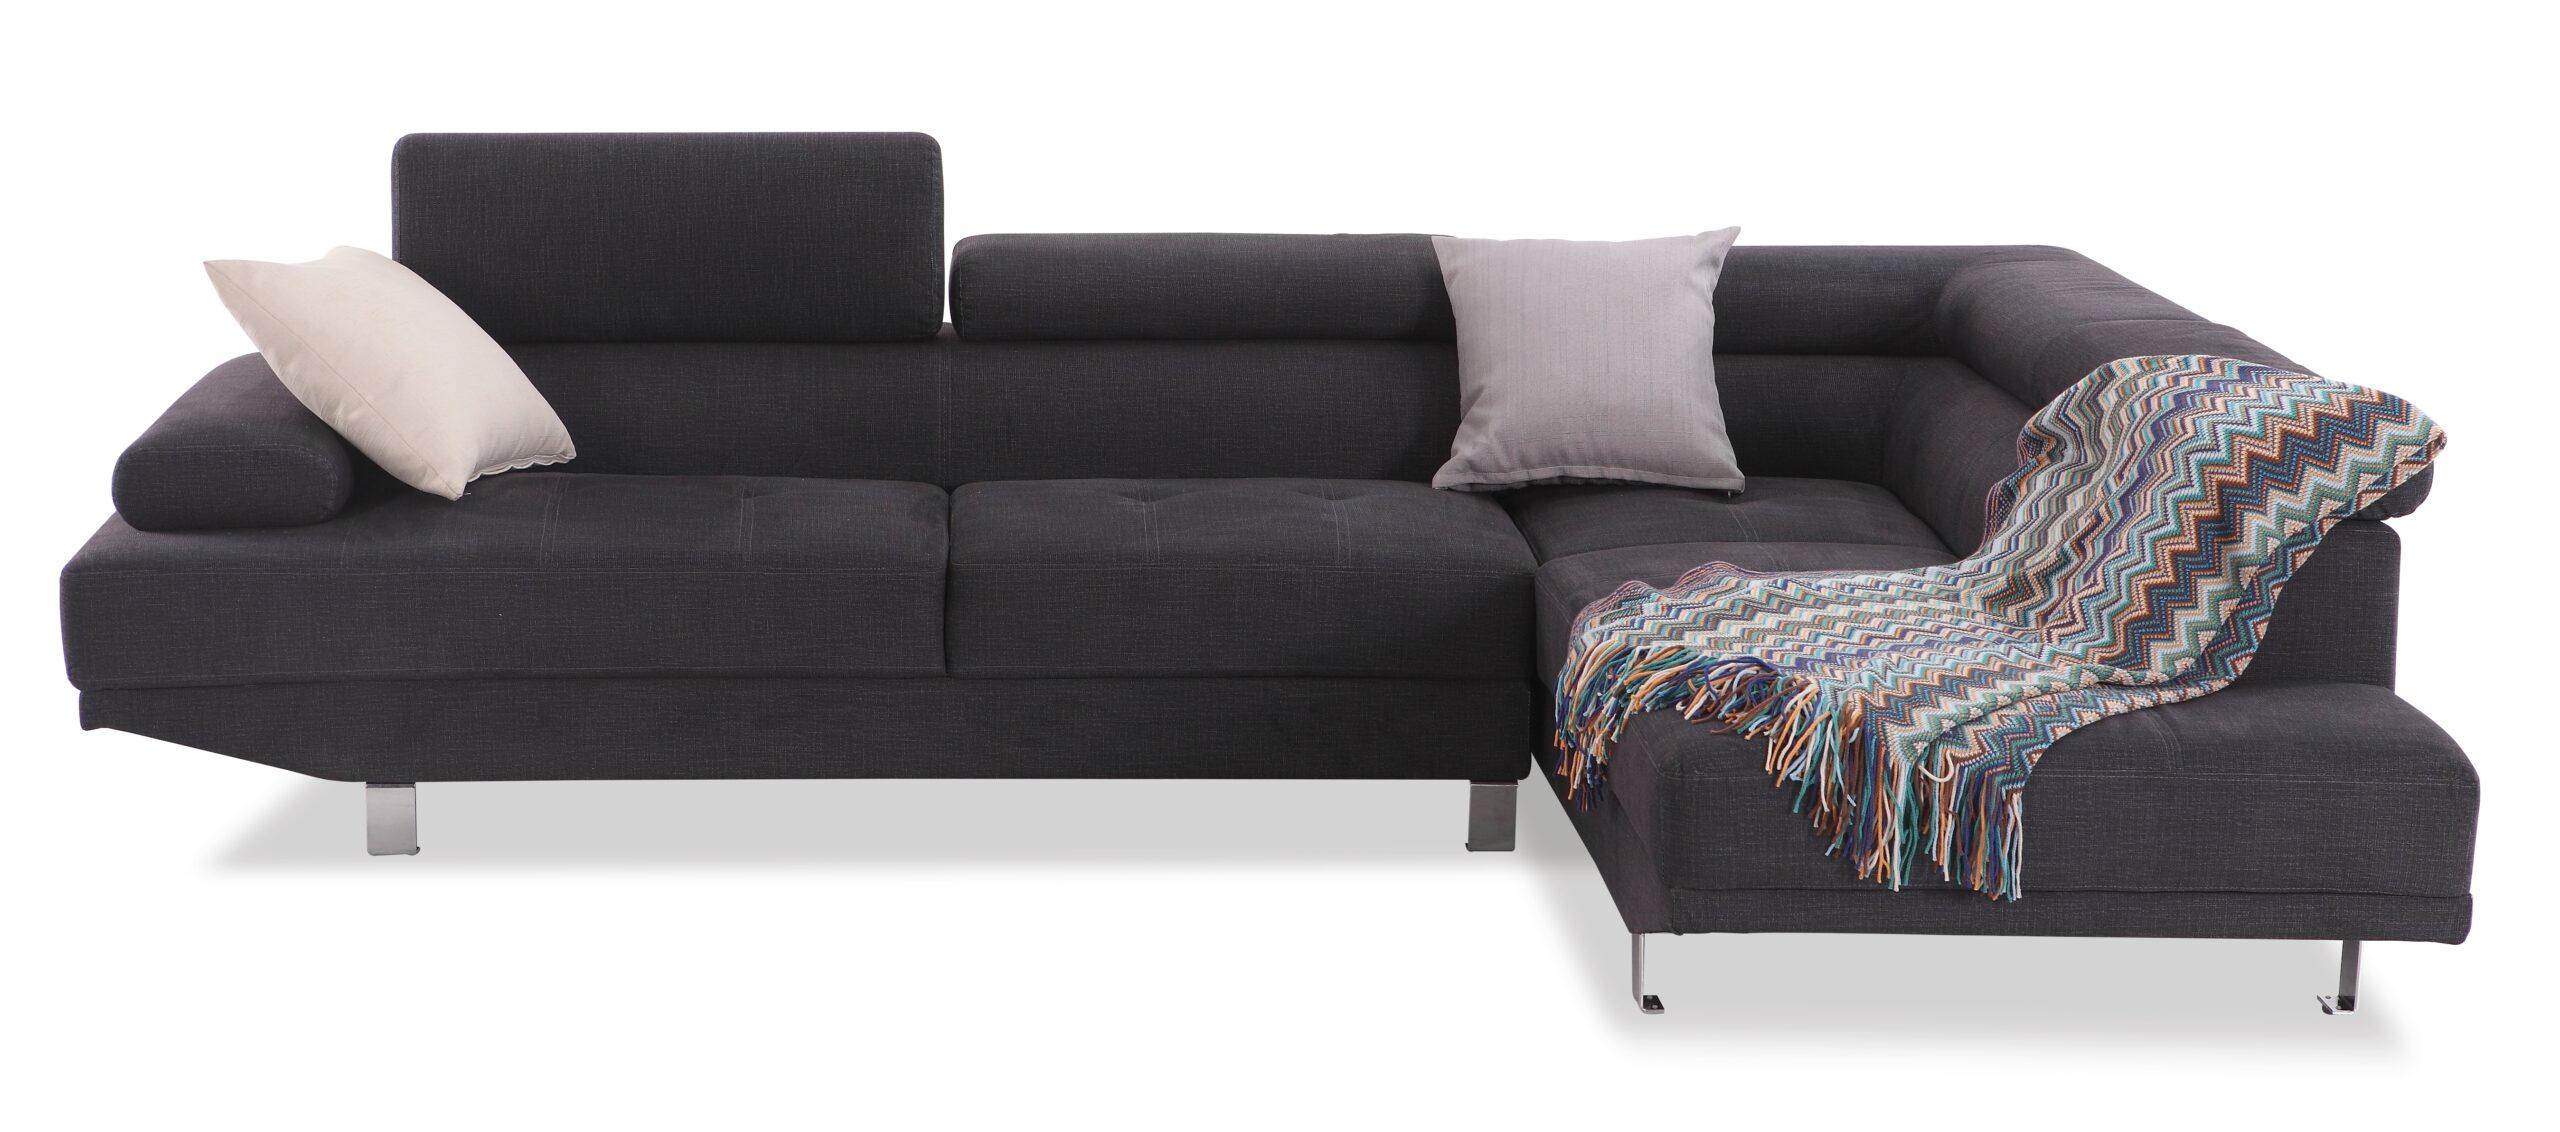 Full Size of Sofa Garnitur 2 Teilig Newtown 267x195 Cm Couch Ecksofa Polstergarnitur L Stressless Mit Led Bett 1 40x2 00 Barock Kolonialstil Schlaffunktion Federkern Sofa Sofa Garnitur 2 Teilig